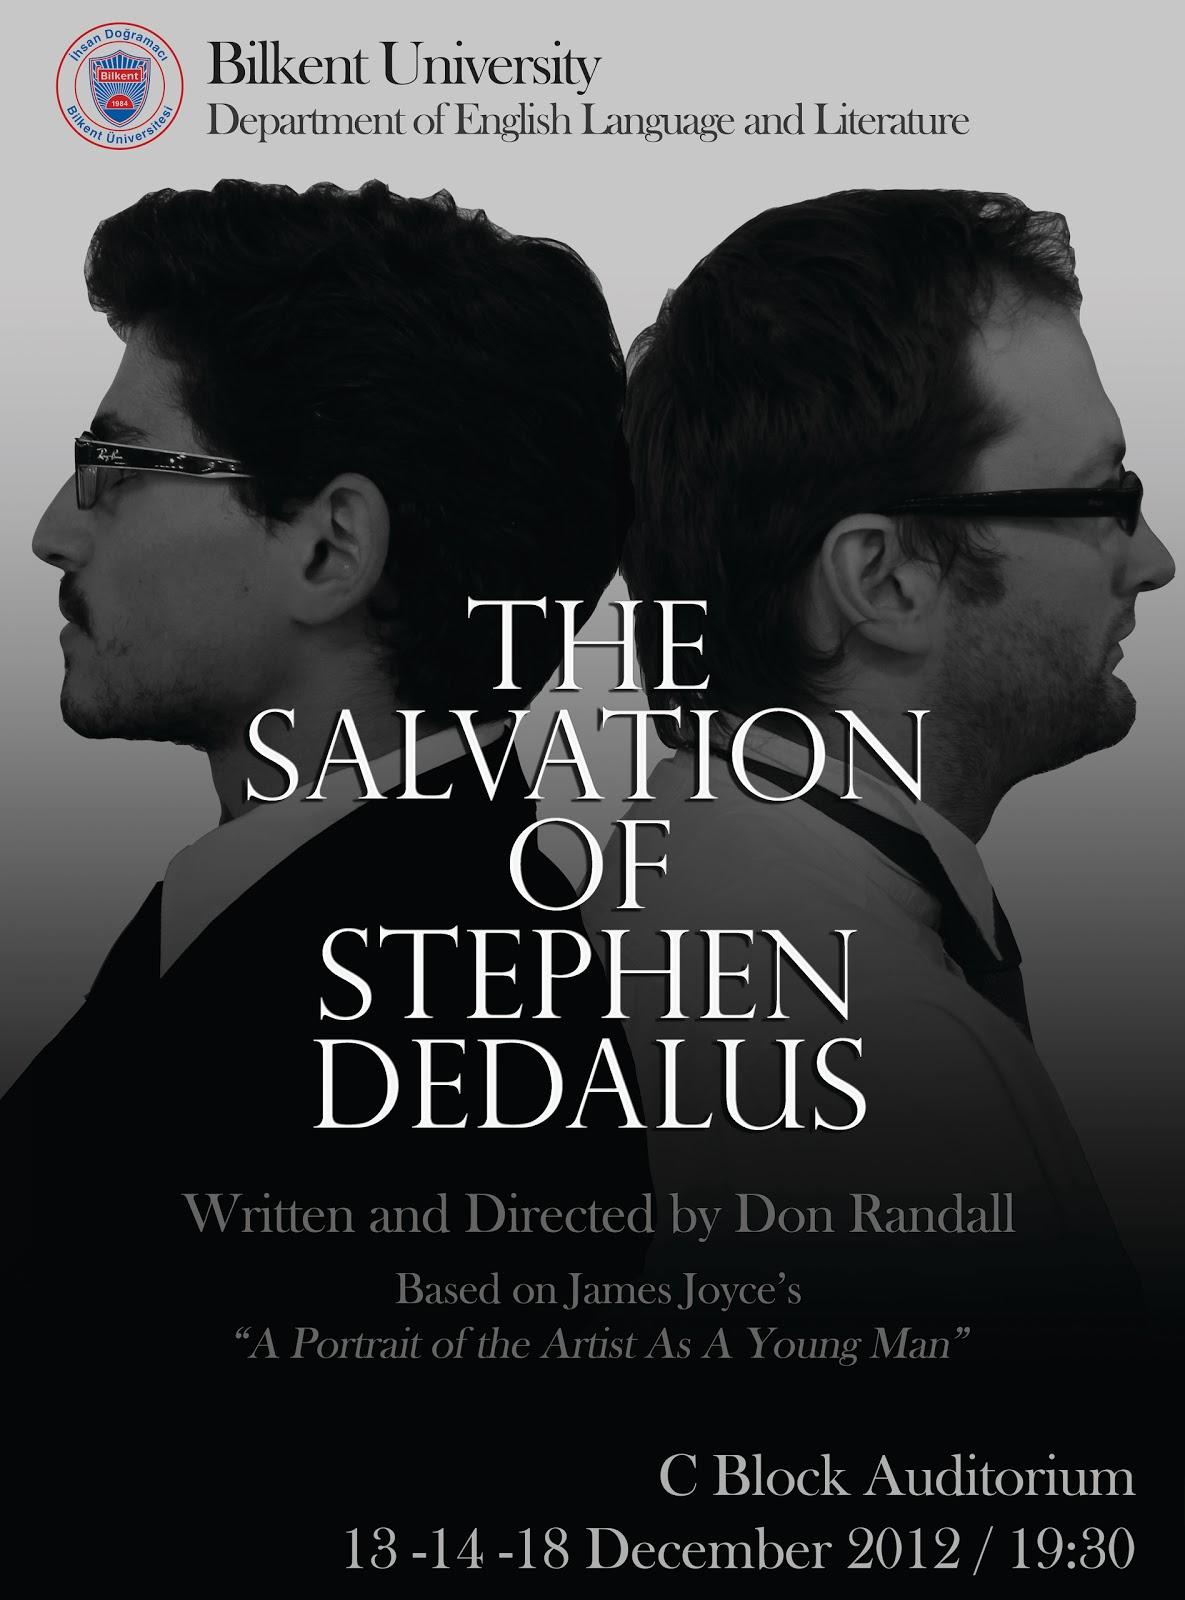 Stephen dedalus